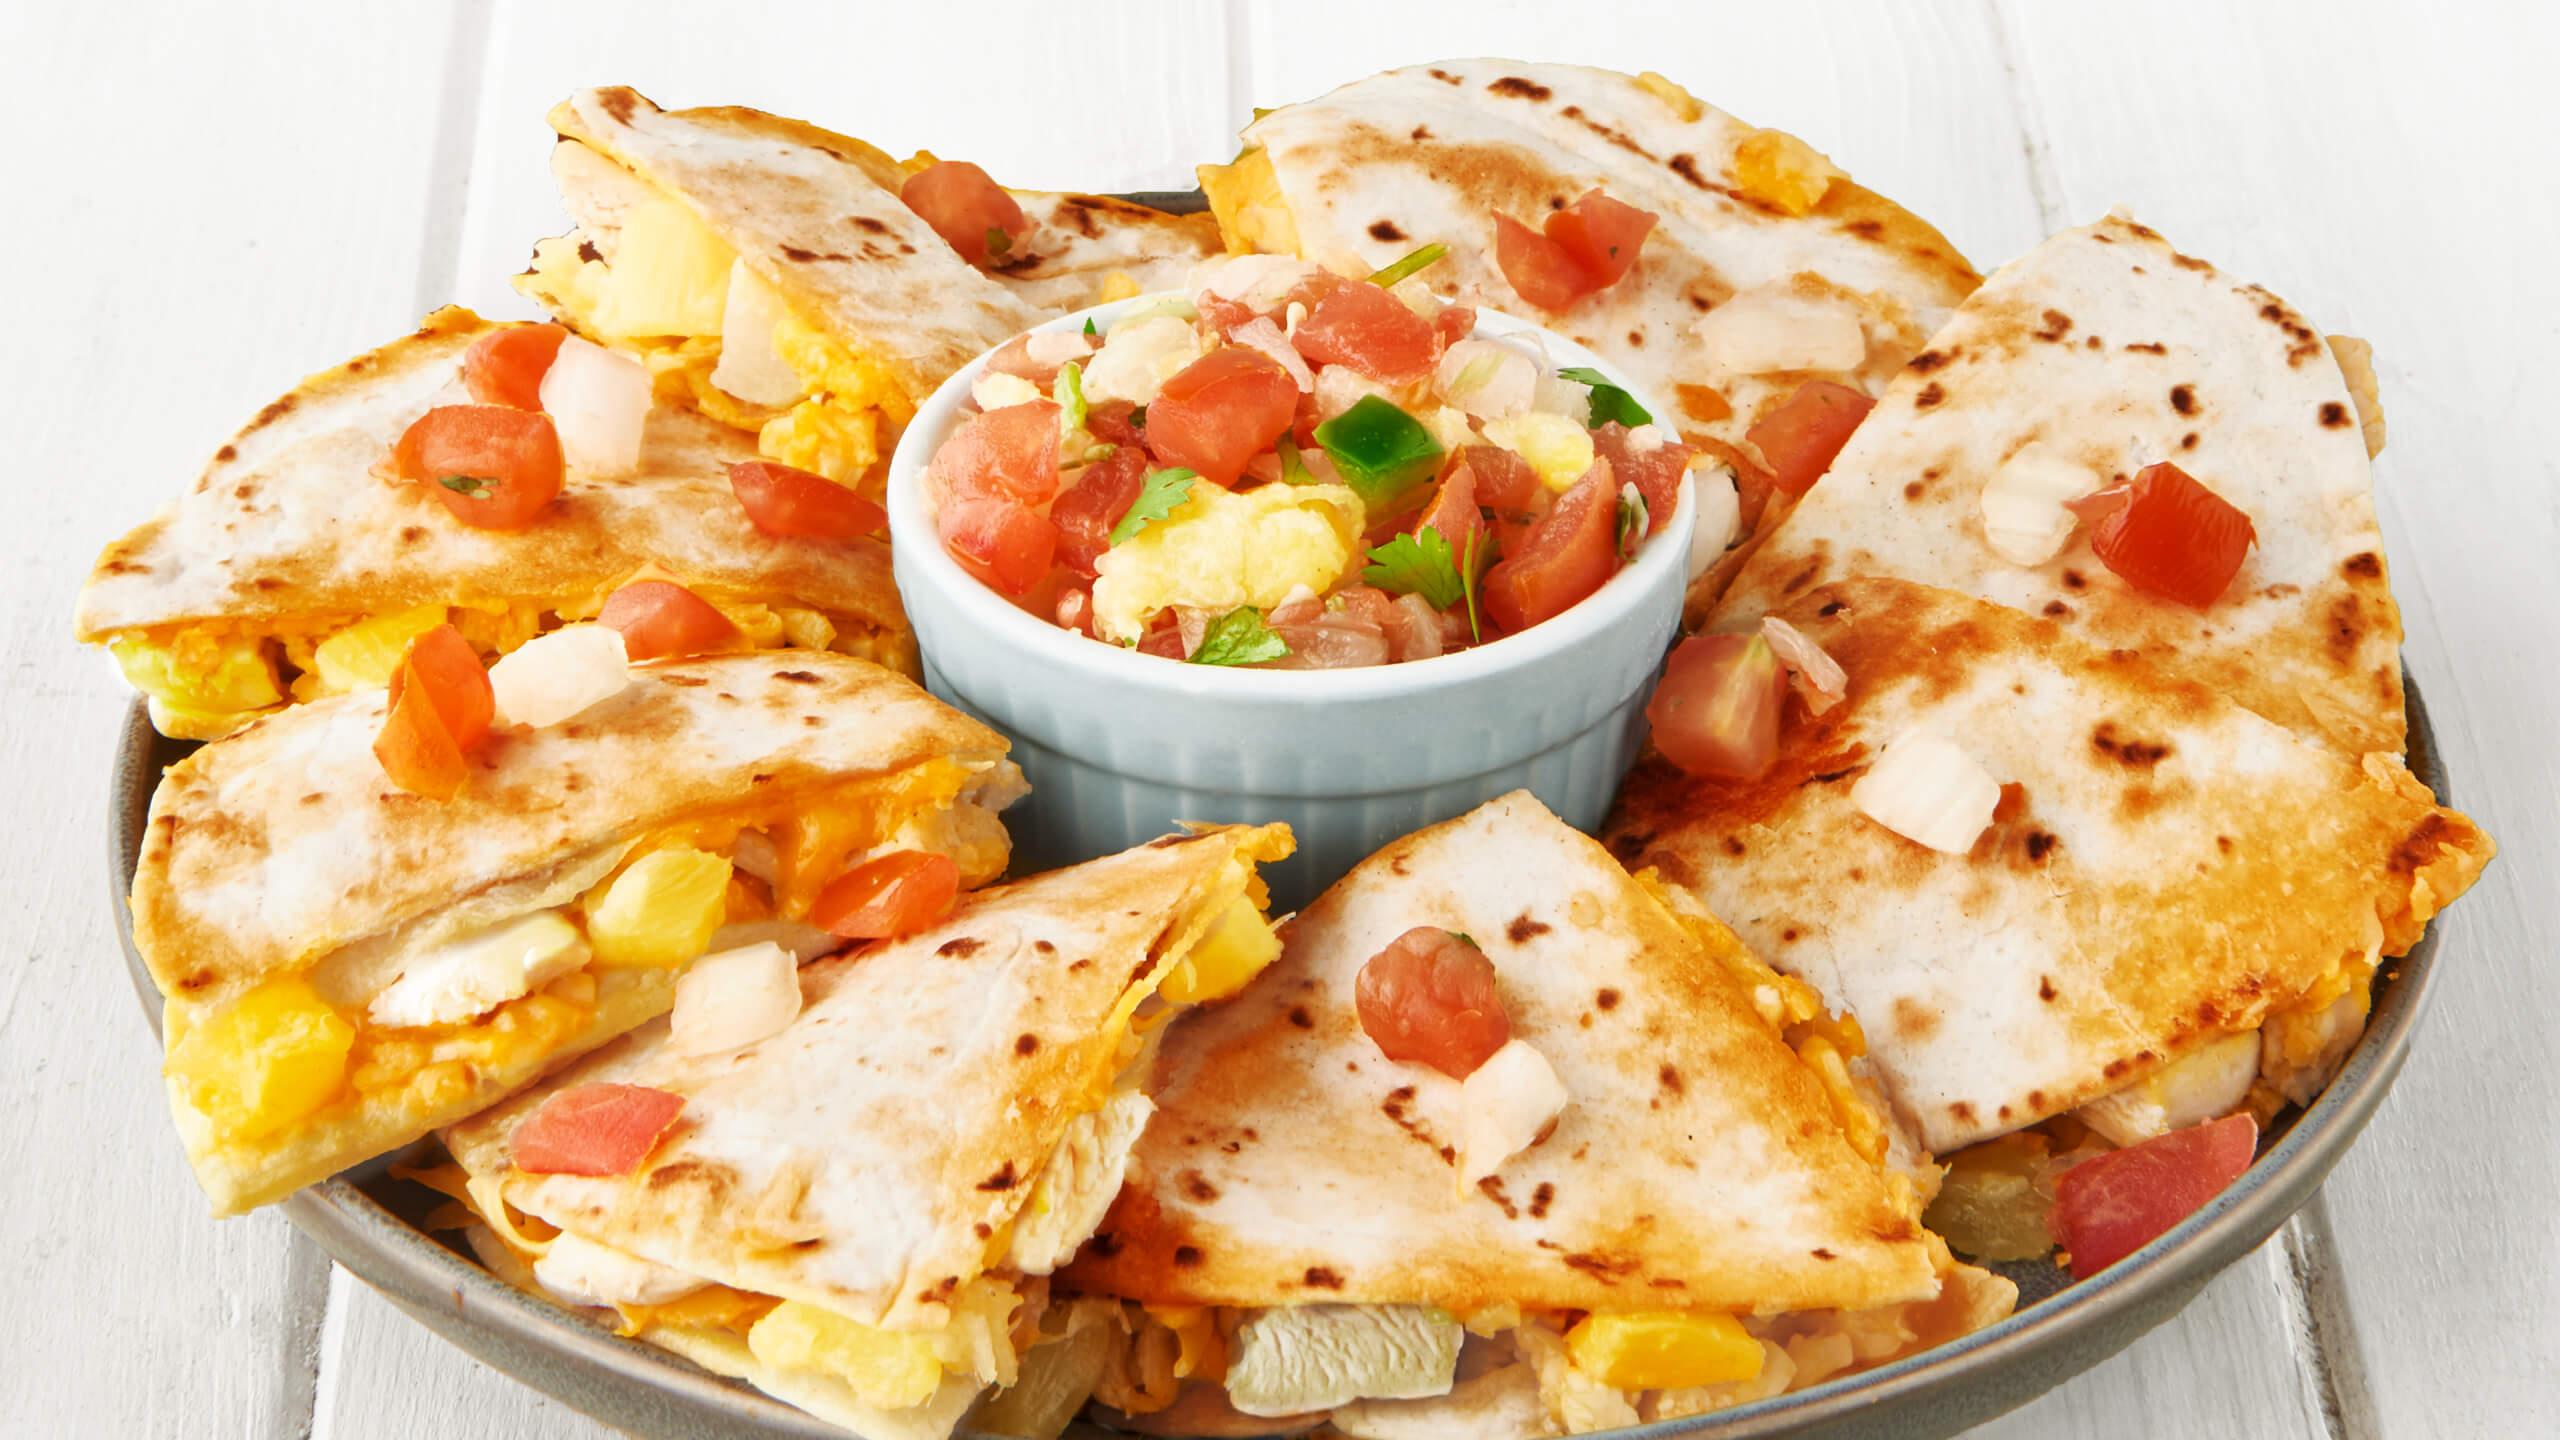 Caramelized Pineapple & Chicken Quesadillas